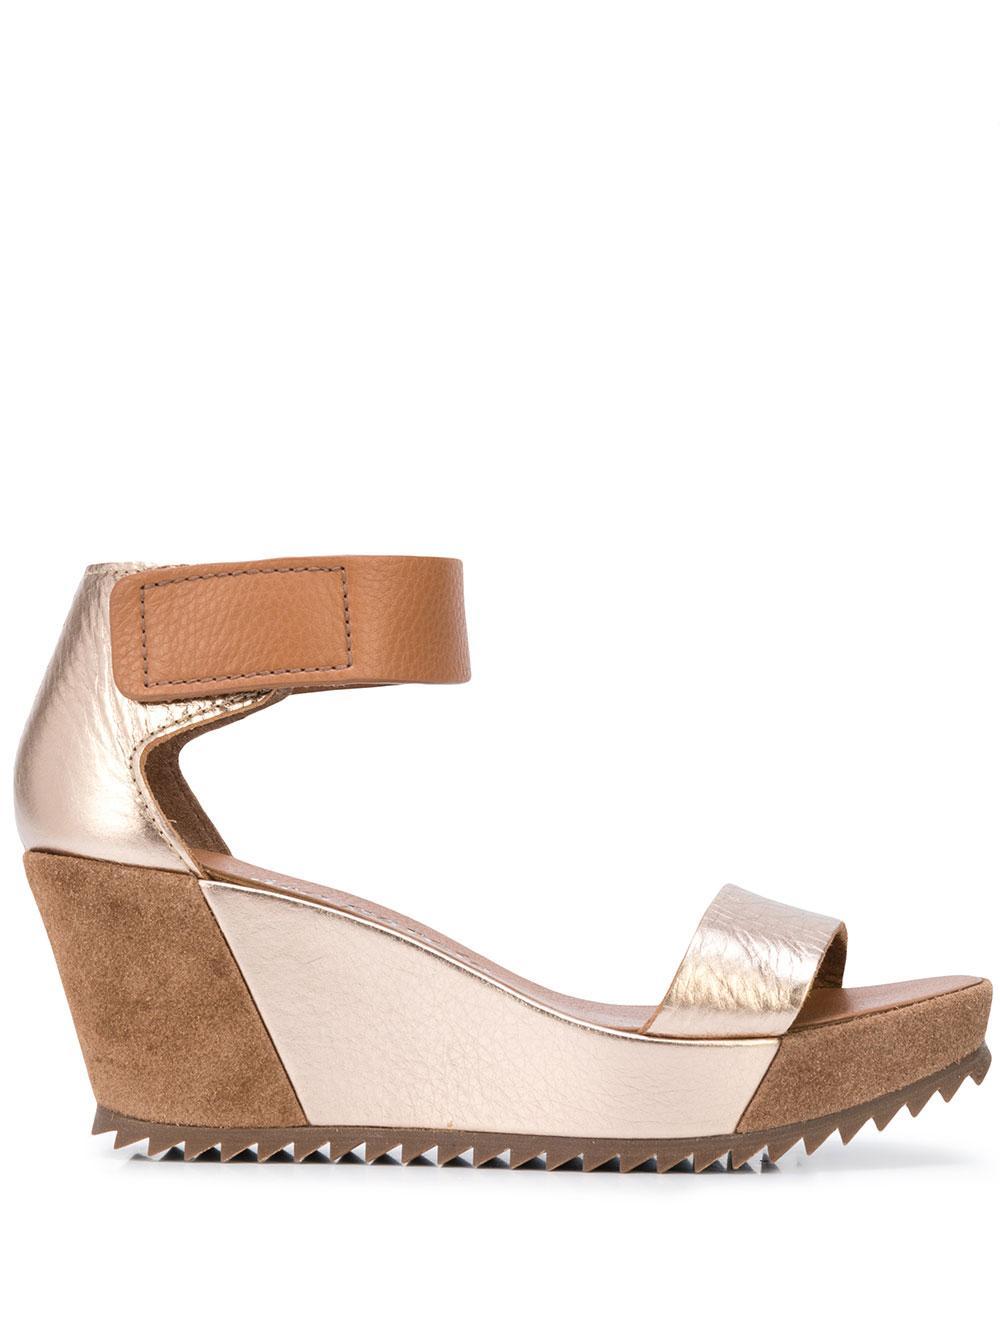 Lame Platform Wedge Sandal With Ankle St Item # FIDELIA-CVLM